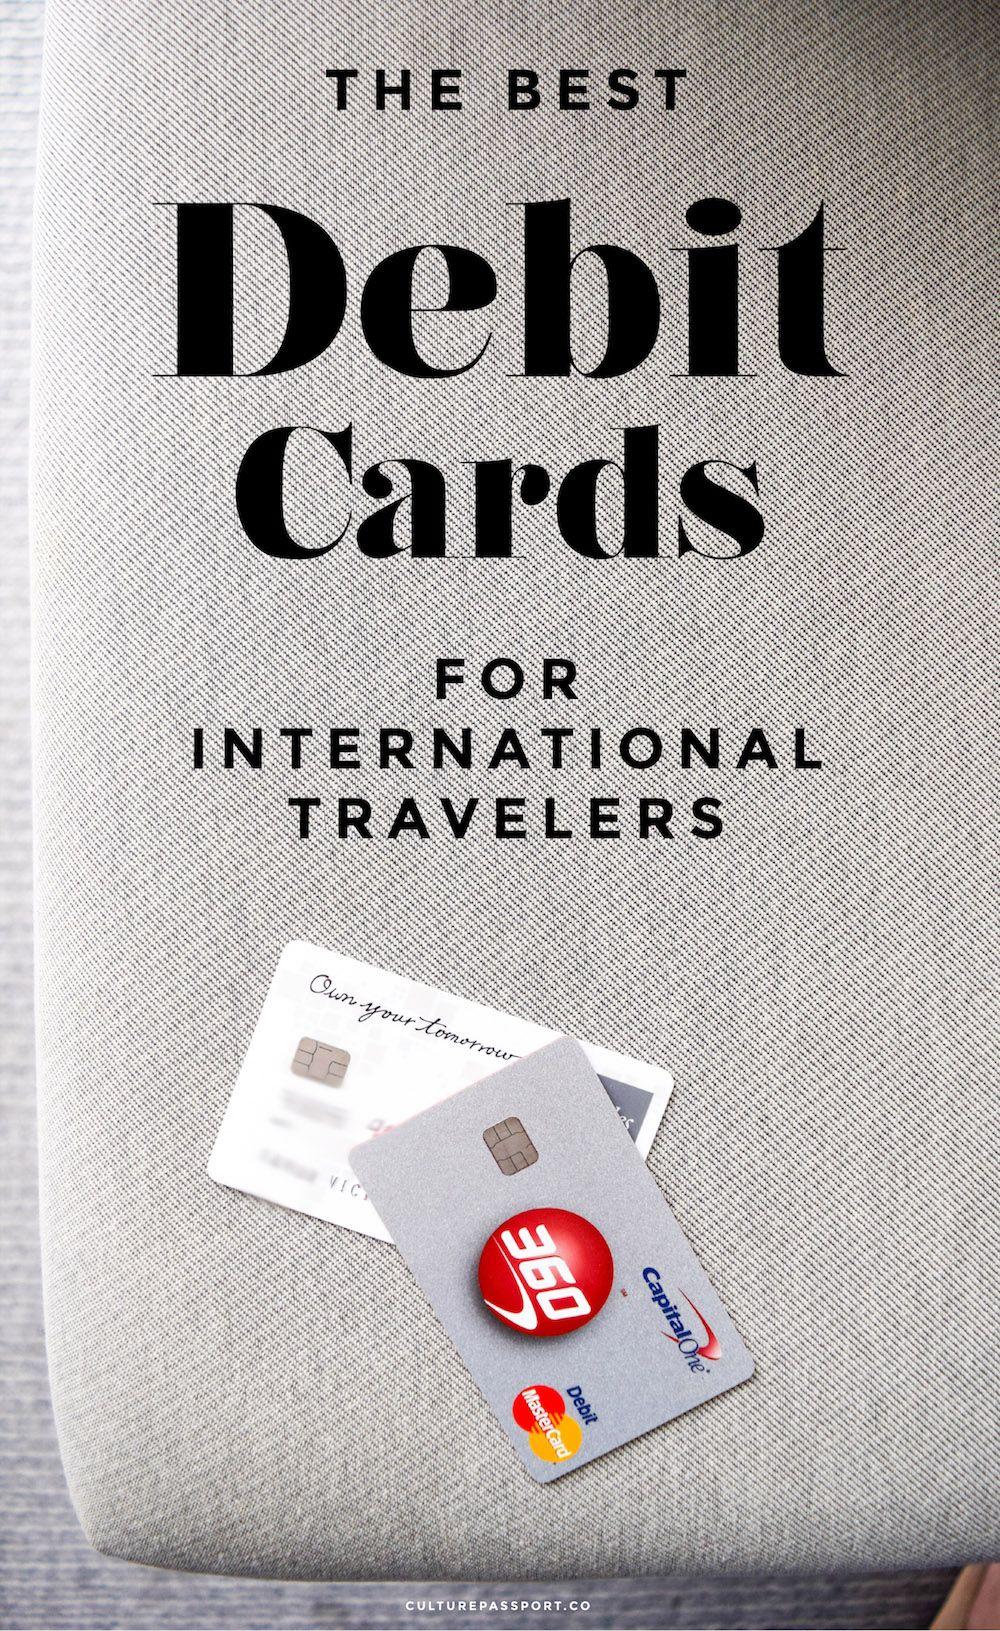 Best debit cards for international american travelers